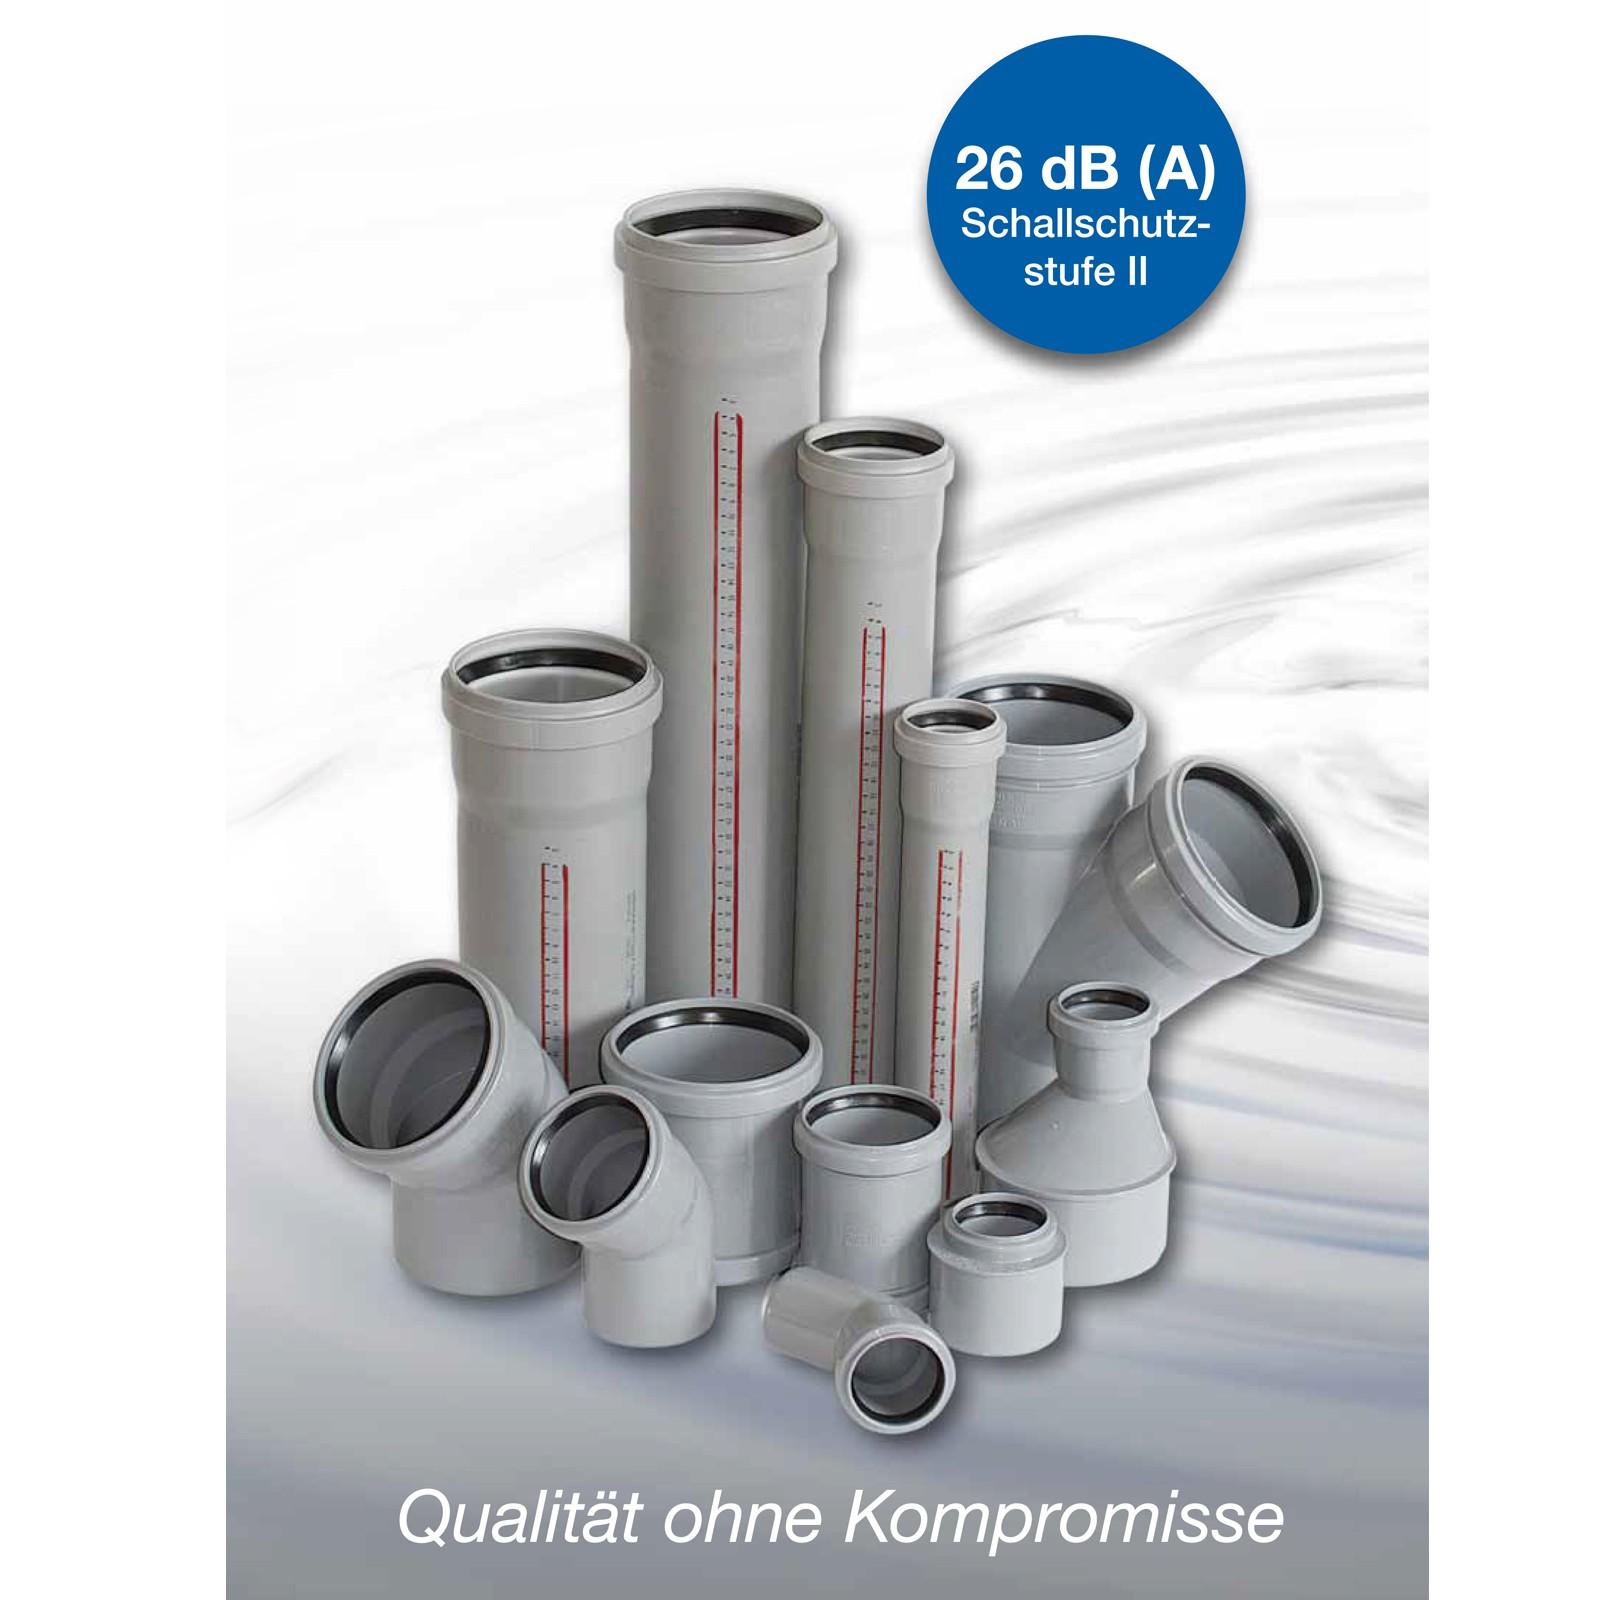 HT Rohr DN75 x 2000mm 2m HTEM DN70 NW75 NW70 75mm 70mm Abwasserrohr Abflussrohr